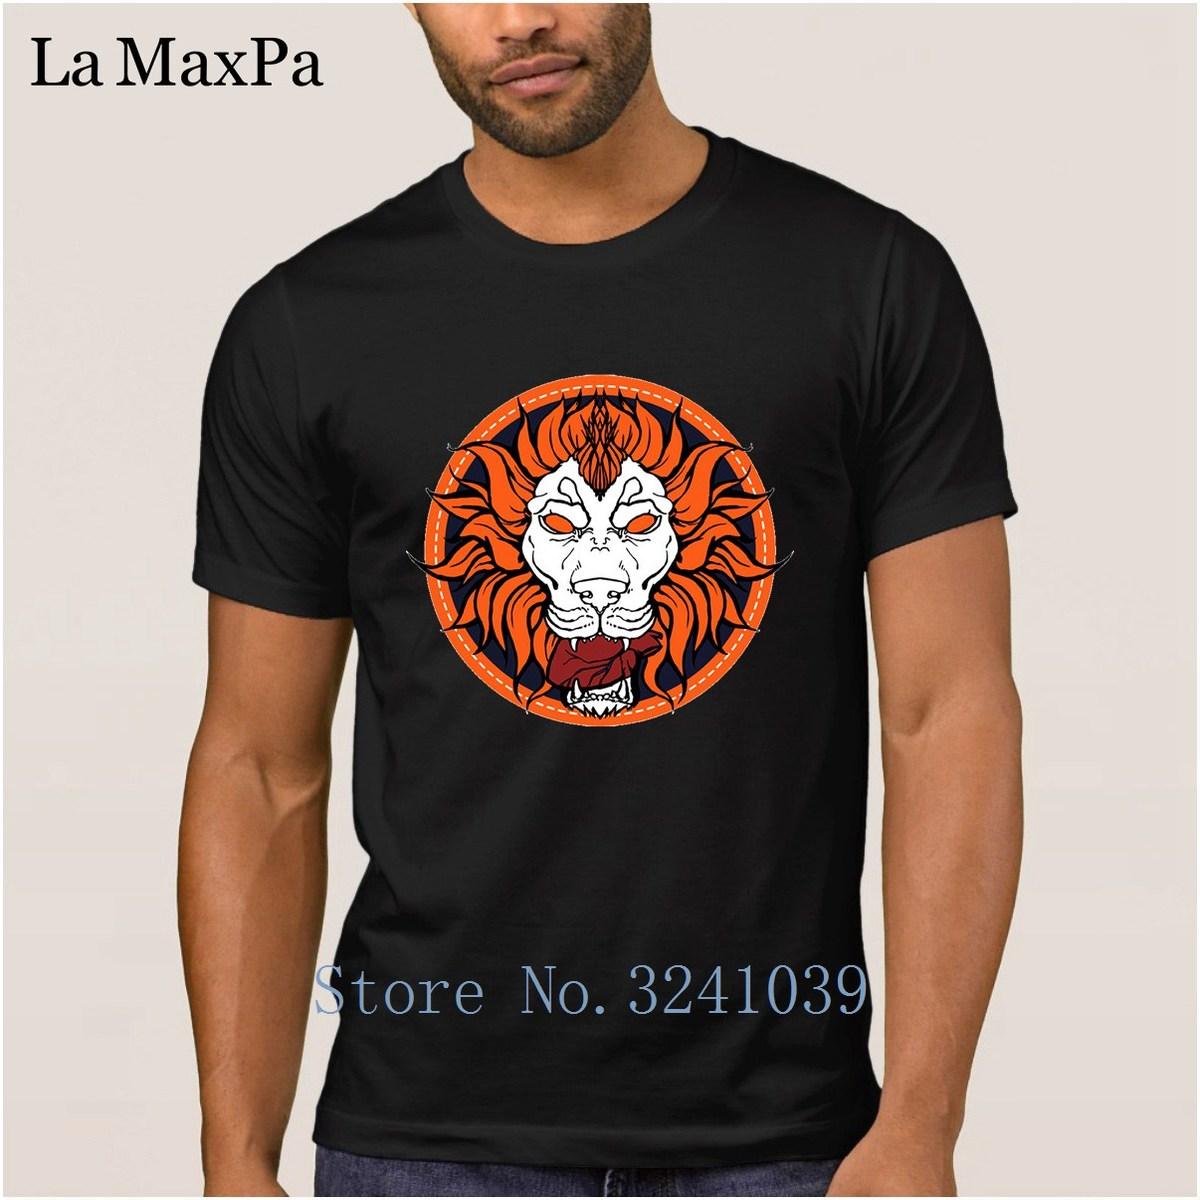 Knitted Funny Men T Shirt Cotton Simple 2018 Tshirt Man Shado Lion T-Shirt For Men Male Camisas Shirt Plus Size 3xl Interesting